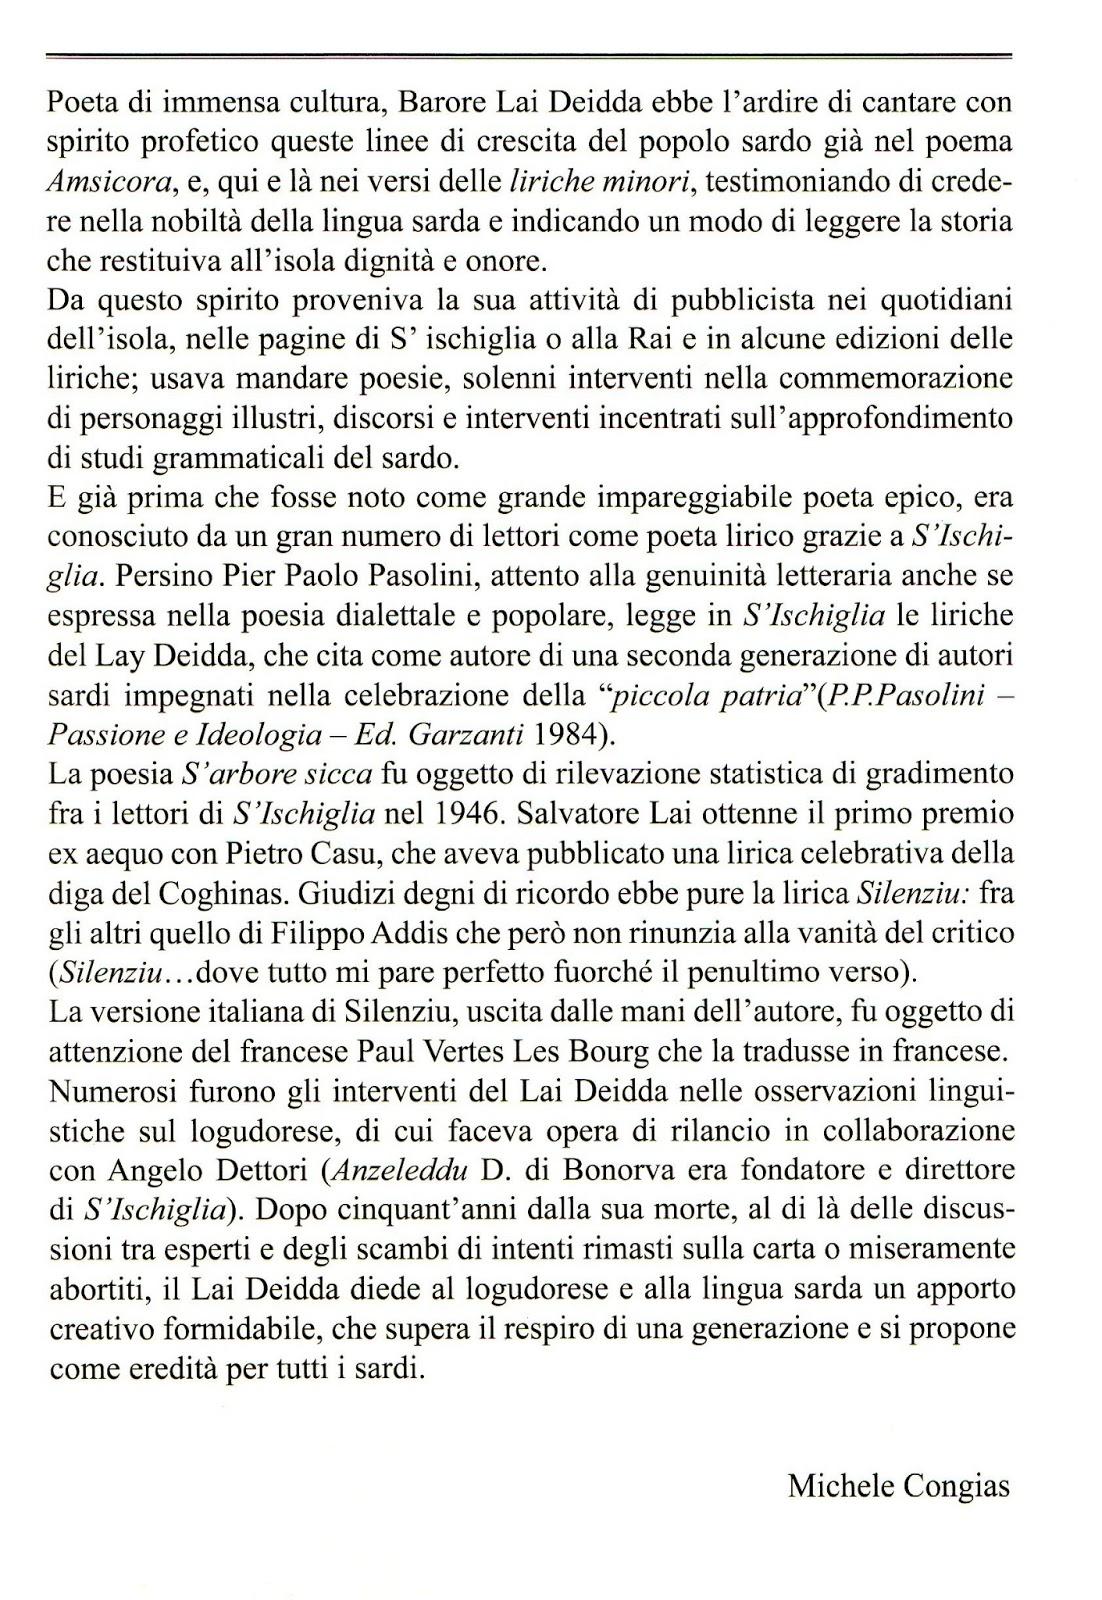 Tonara blog cantos de monte salvatore lai deidda a cura for Letter of interest for promotion template